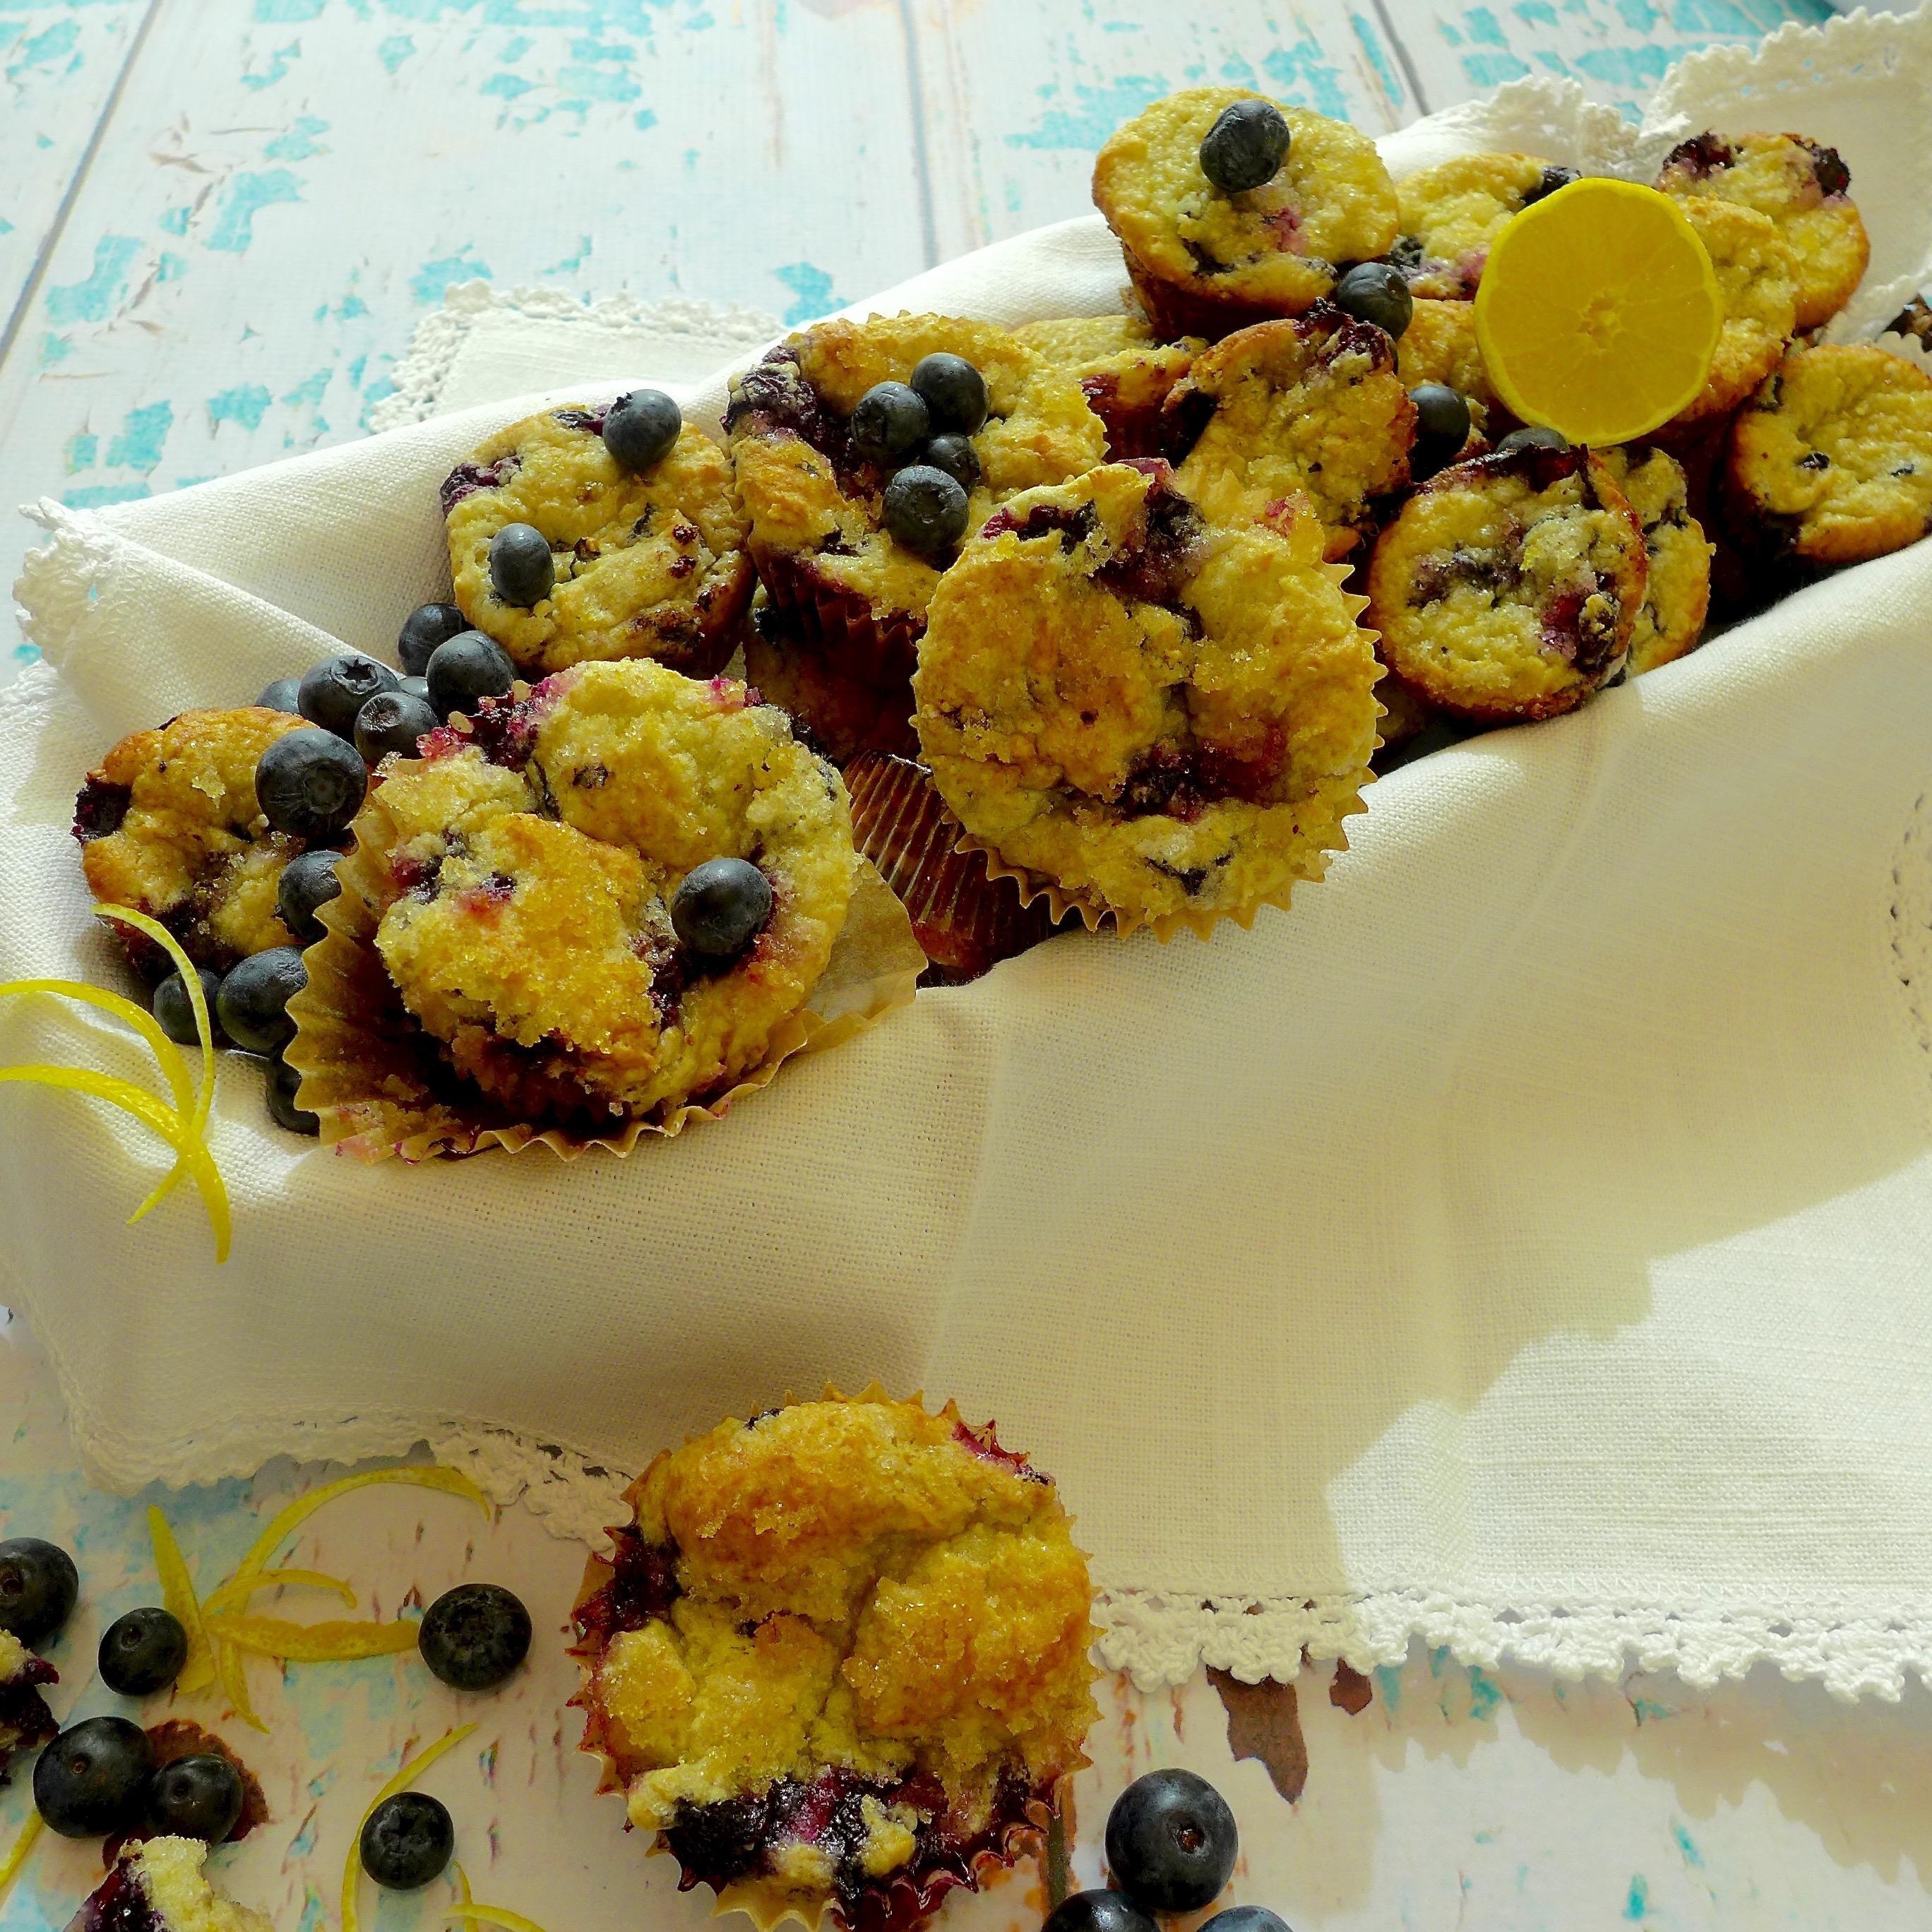 Make 12 regular or 24 mini muffins.